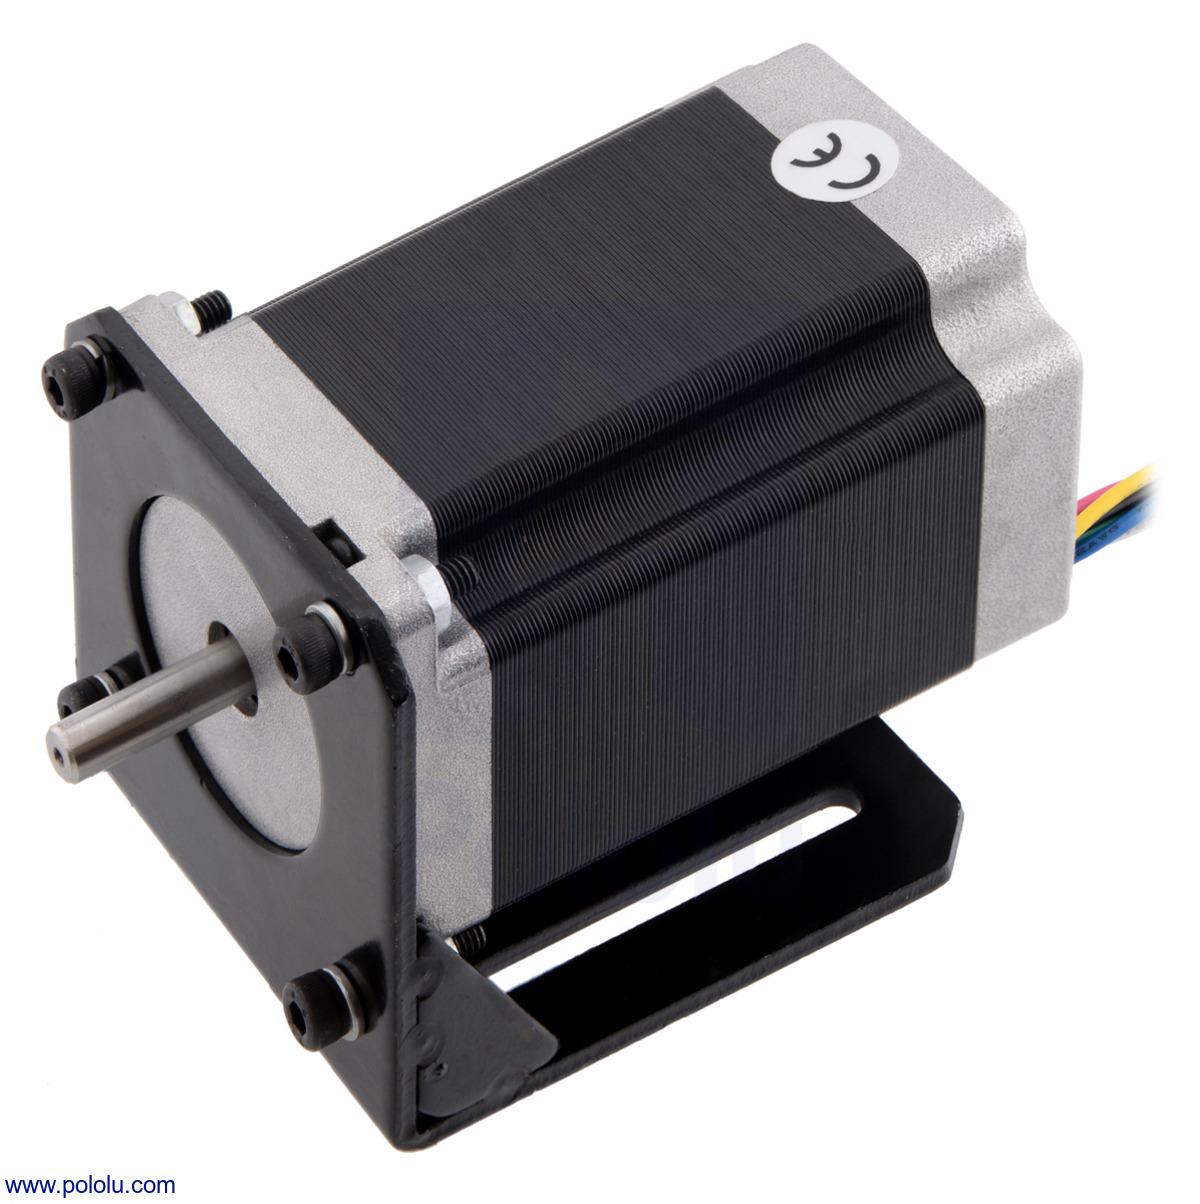 medium resolution of nema 23 stepper motor item 1475 mounted with a steel l bracket for nema 23 stepper motors